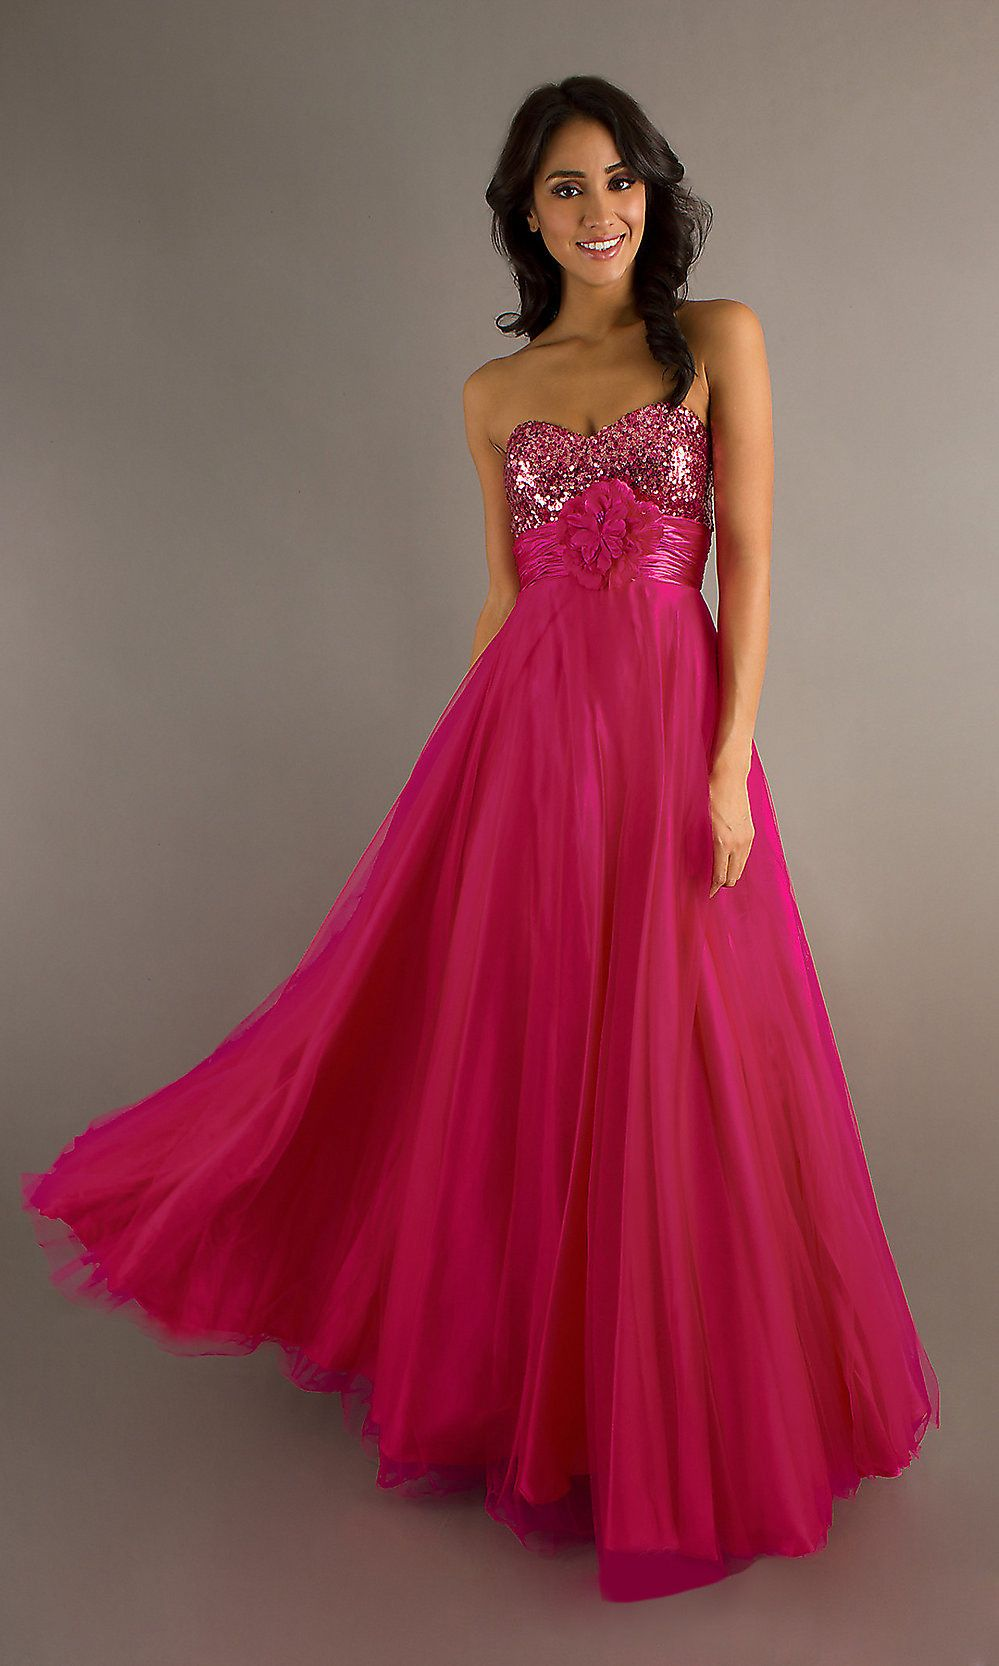 Empire Fuchsia Long Prom Dress Flowy Strapless Sequin Bodice  Prom Dresses  Formal dresses